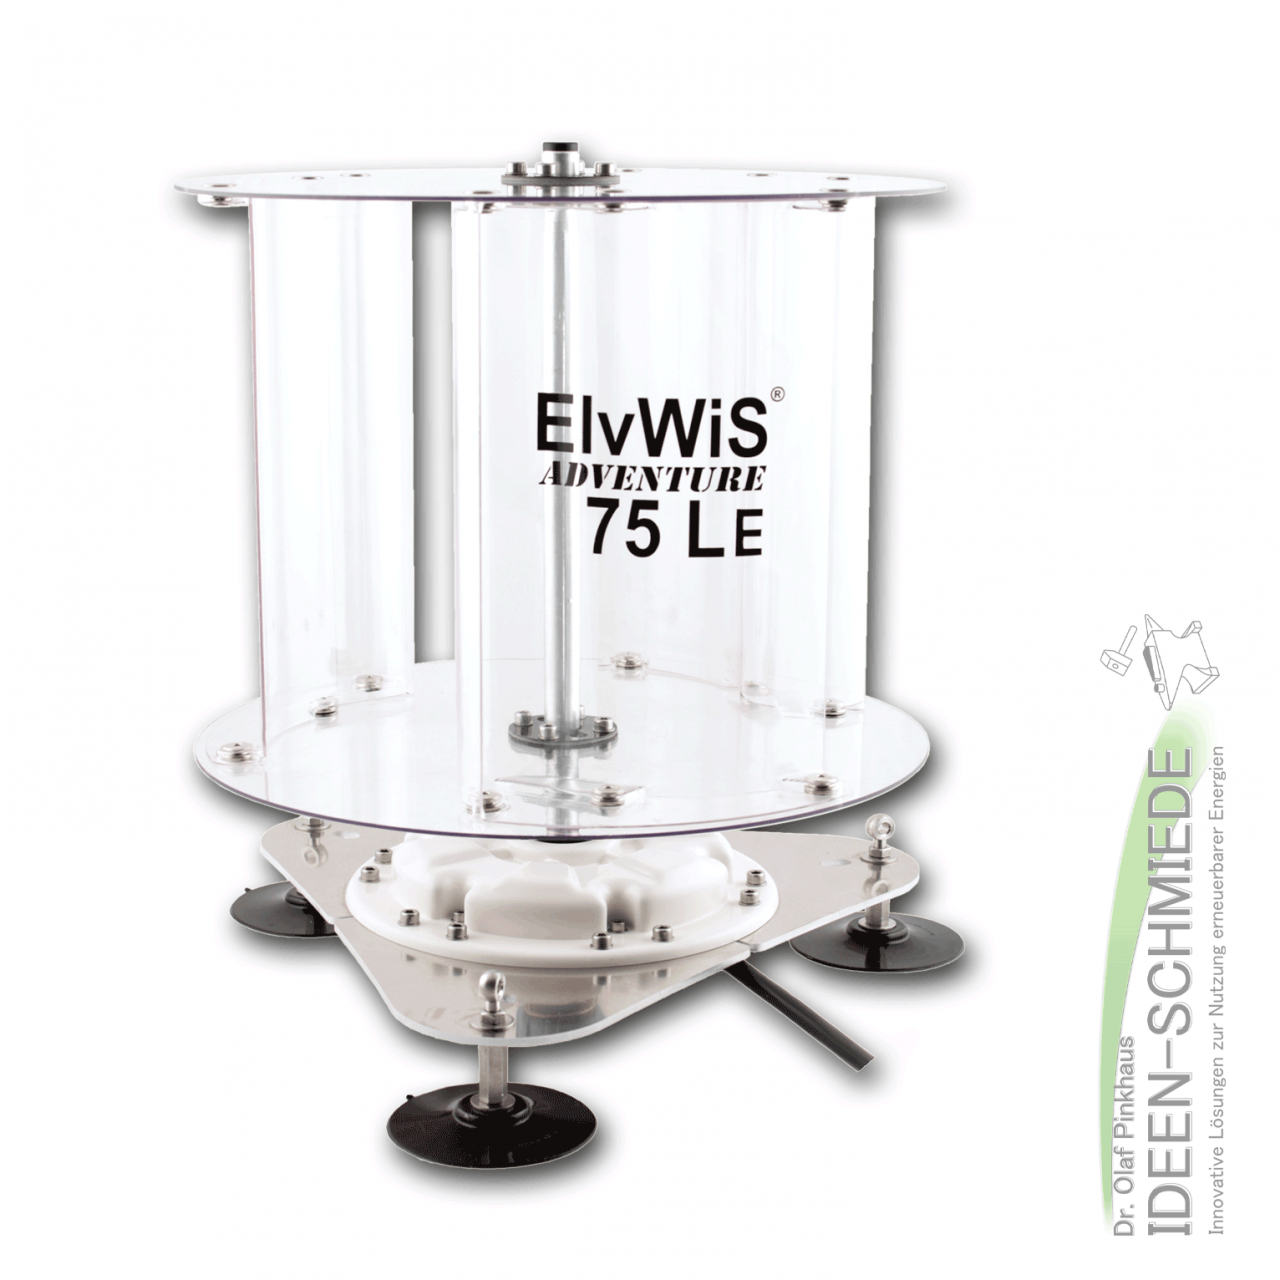 ElvWiS ADVENTURE 75LE Economy Compact